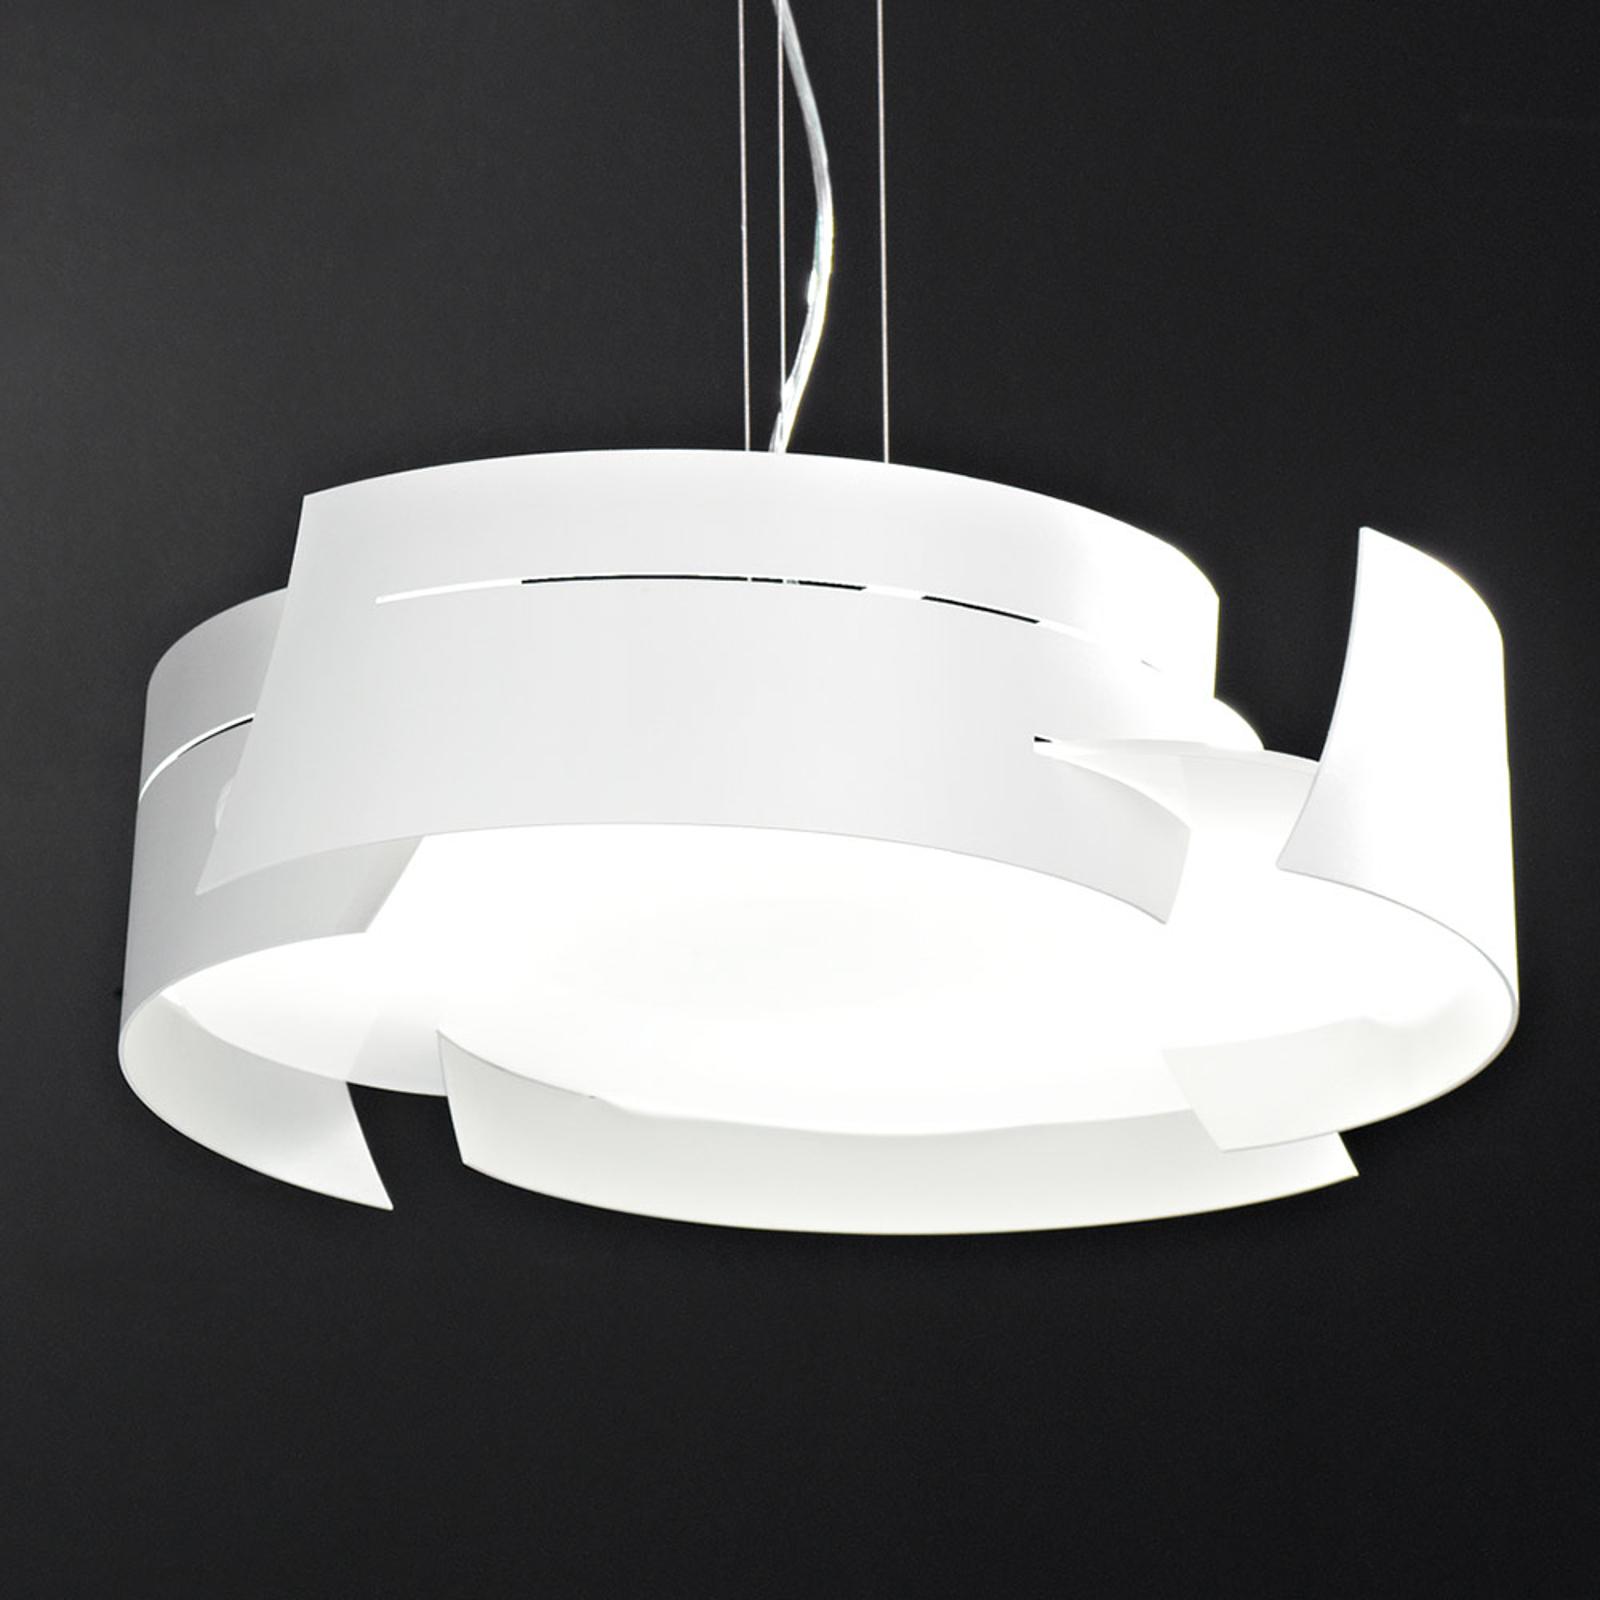 Vulture hanglamp, wit